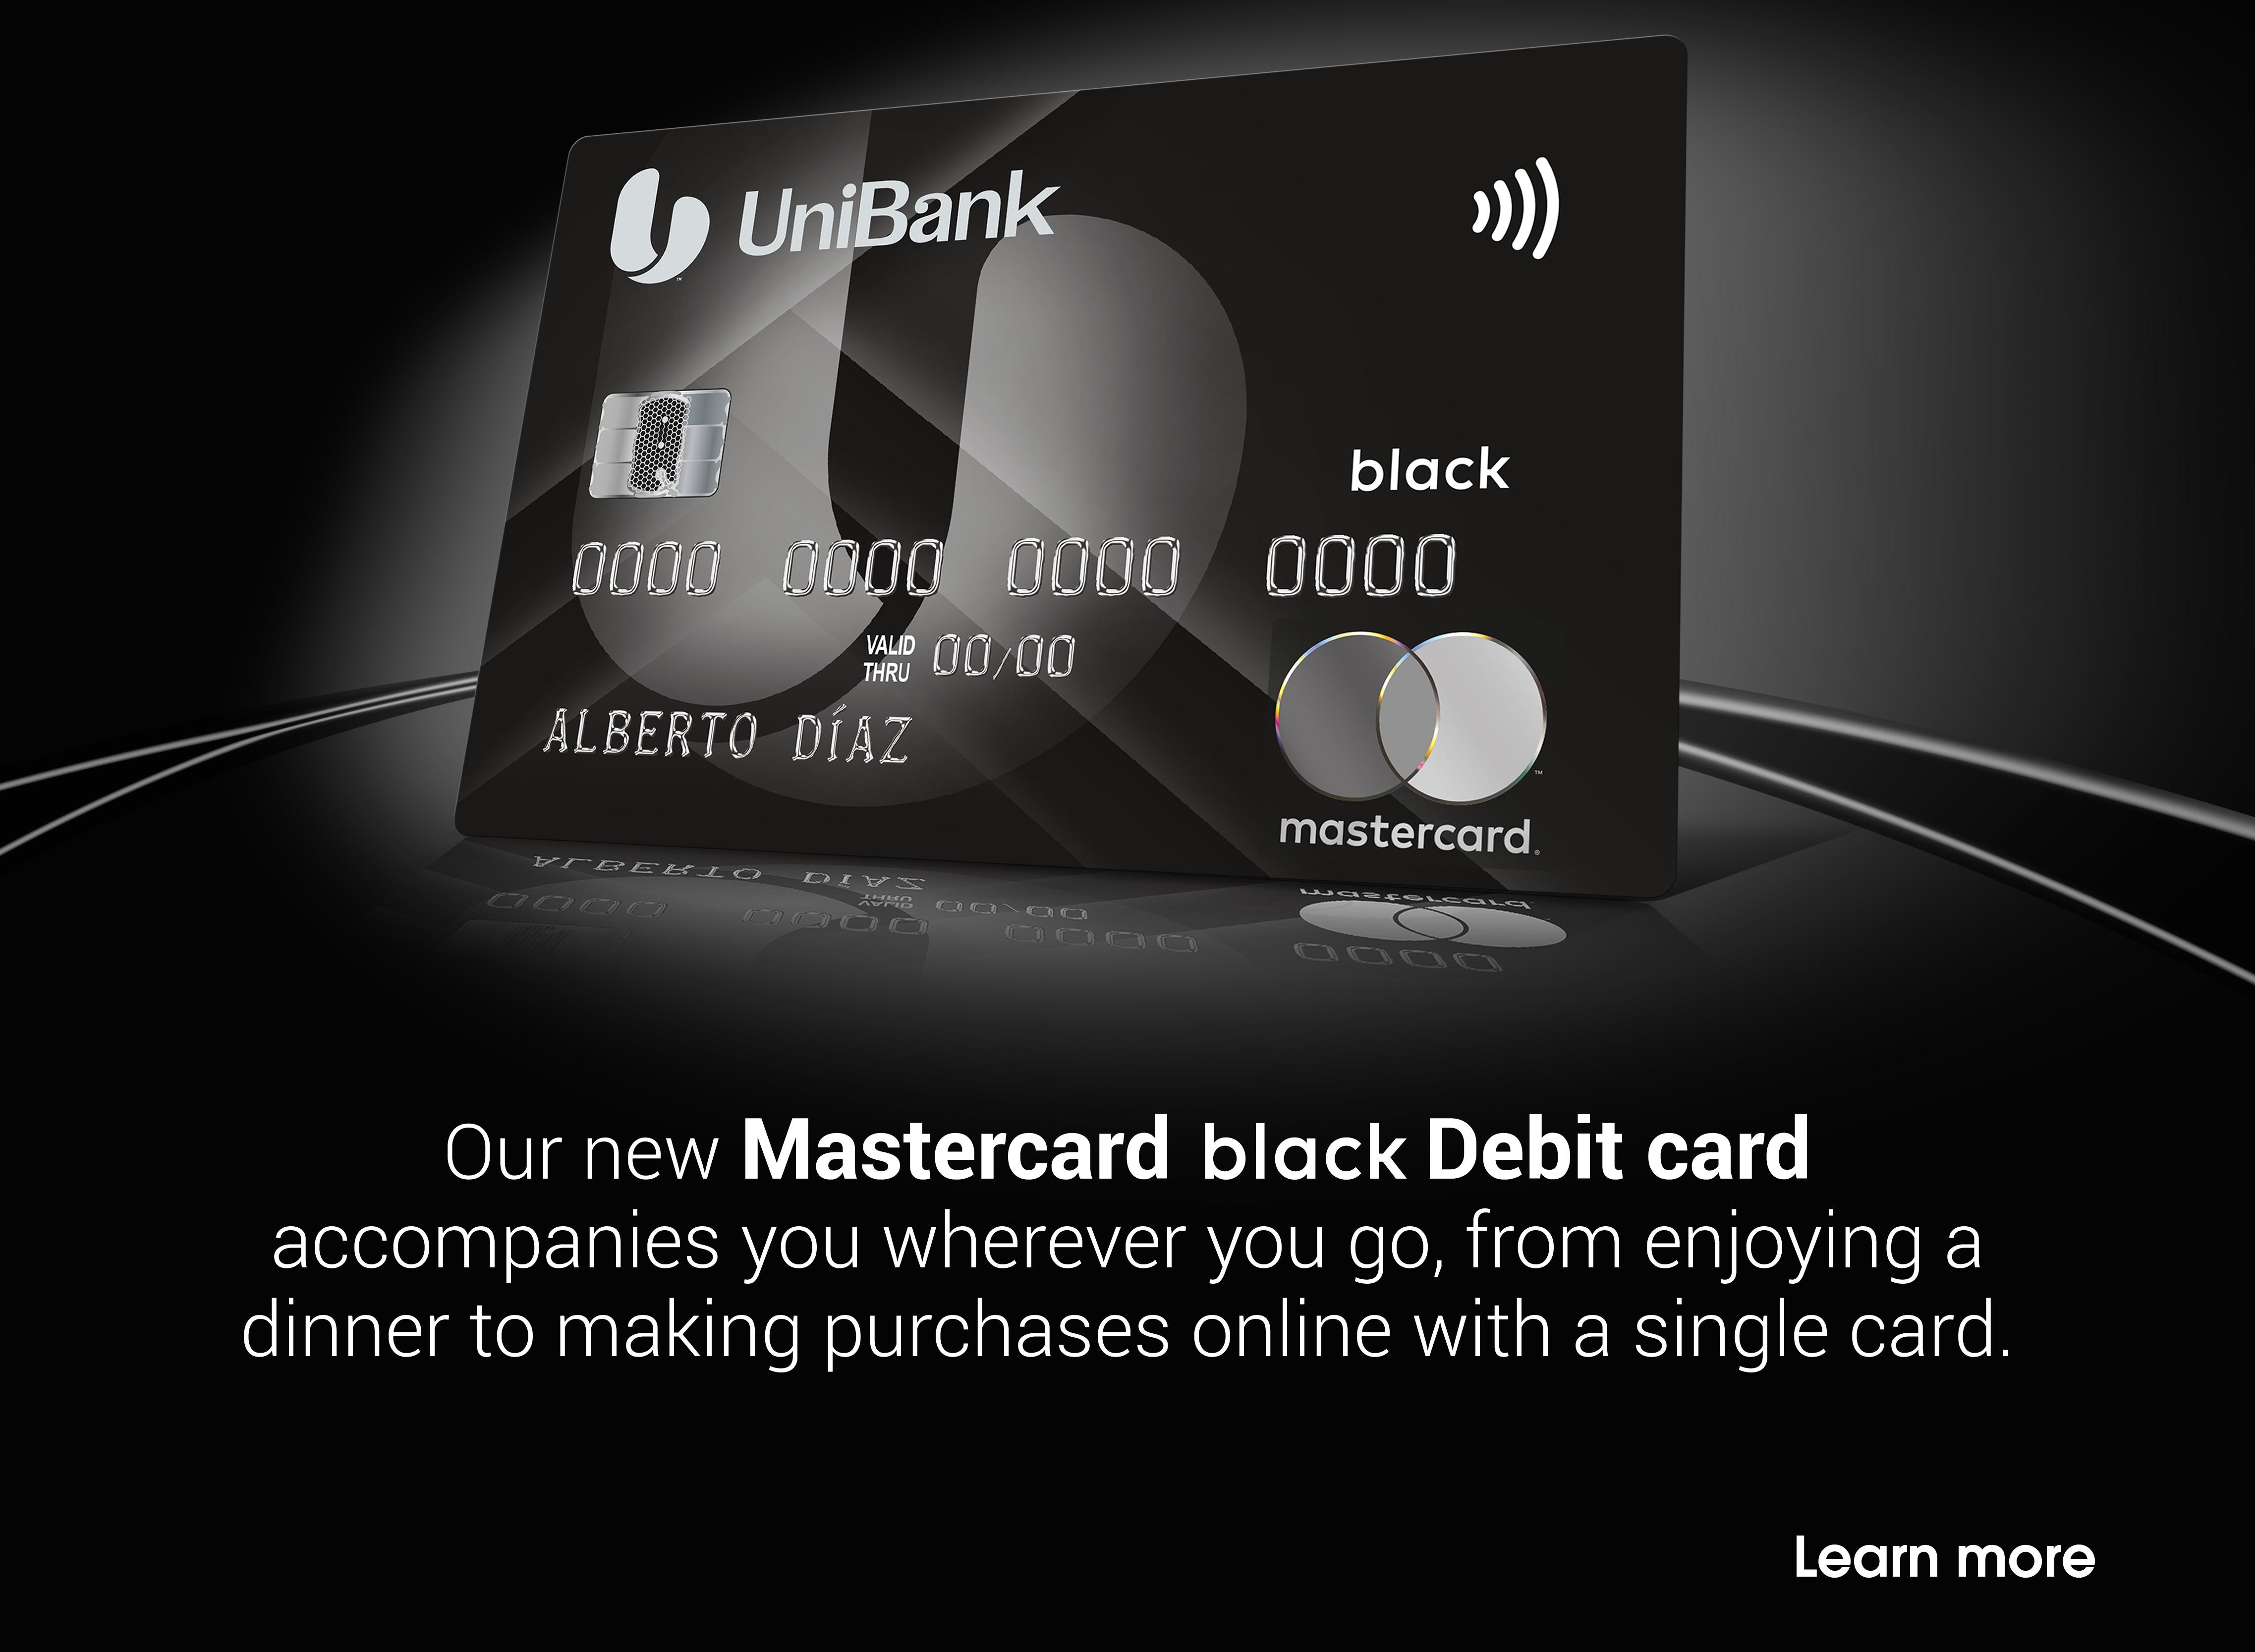 Mastercard Black Debit